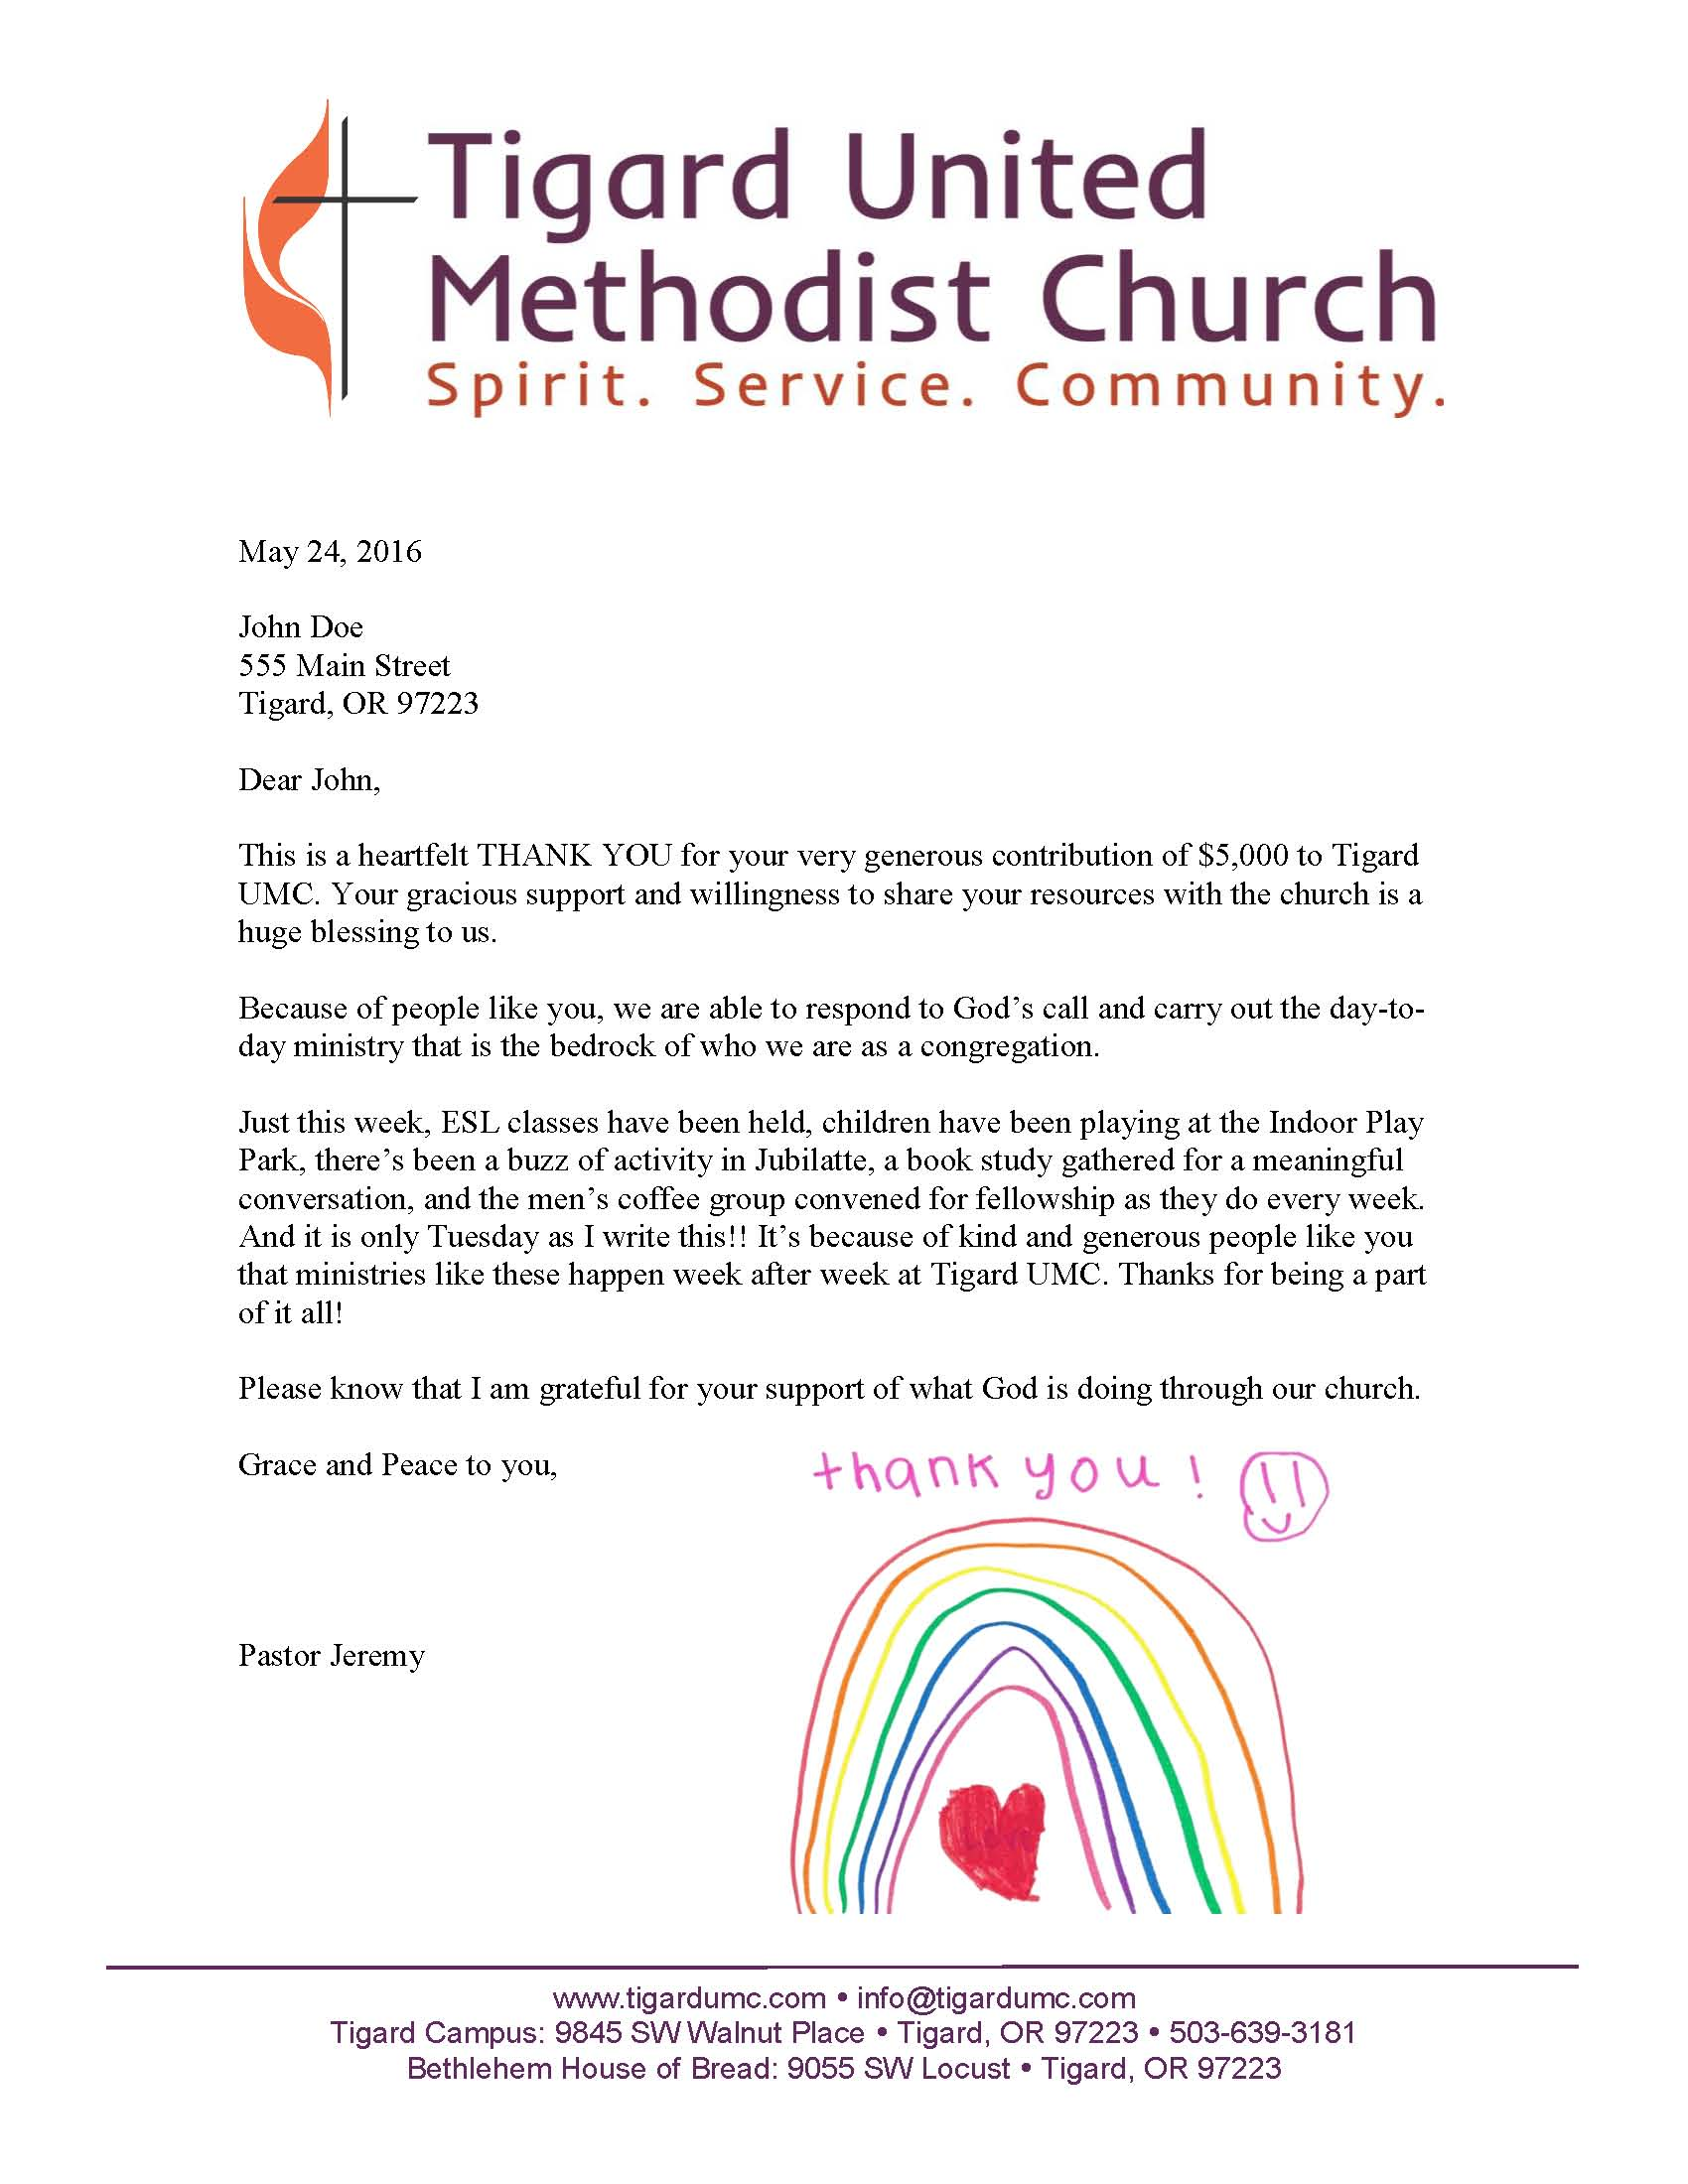 oregon idaho inspiring generosity click here to the full letter